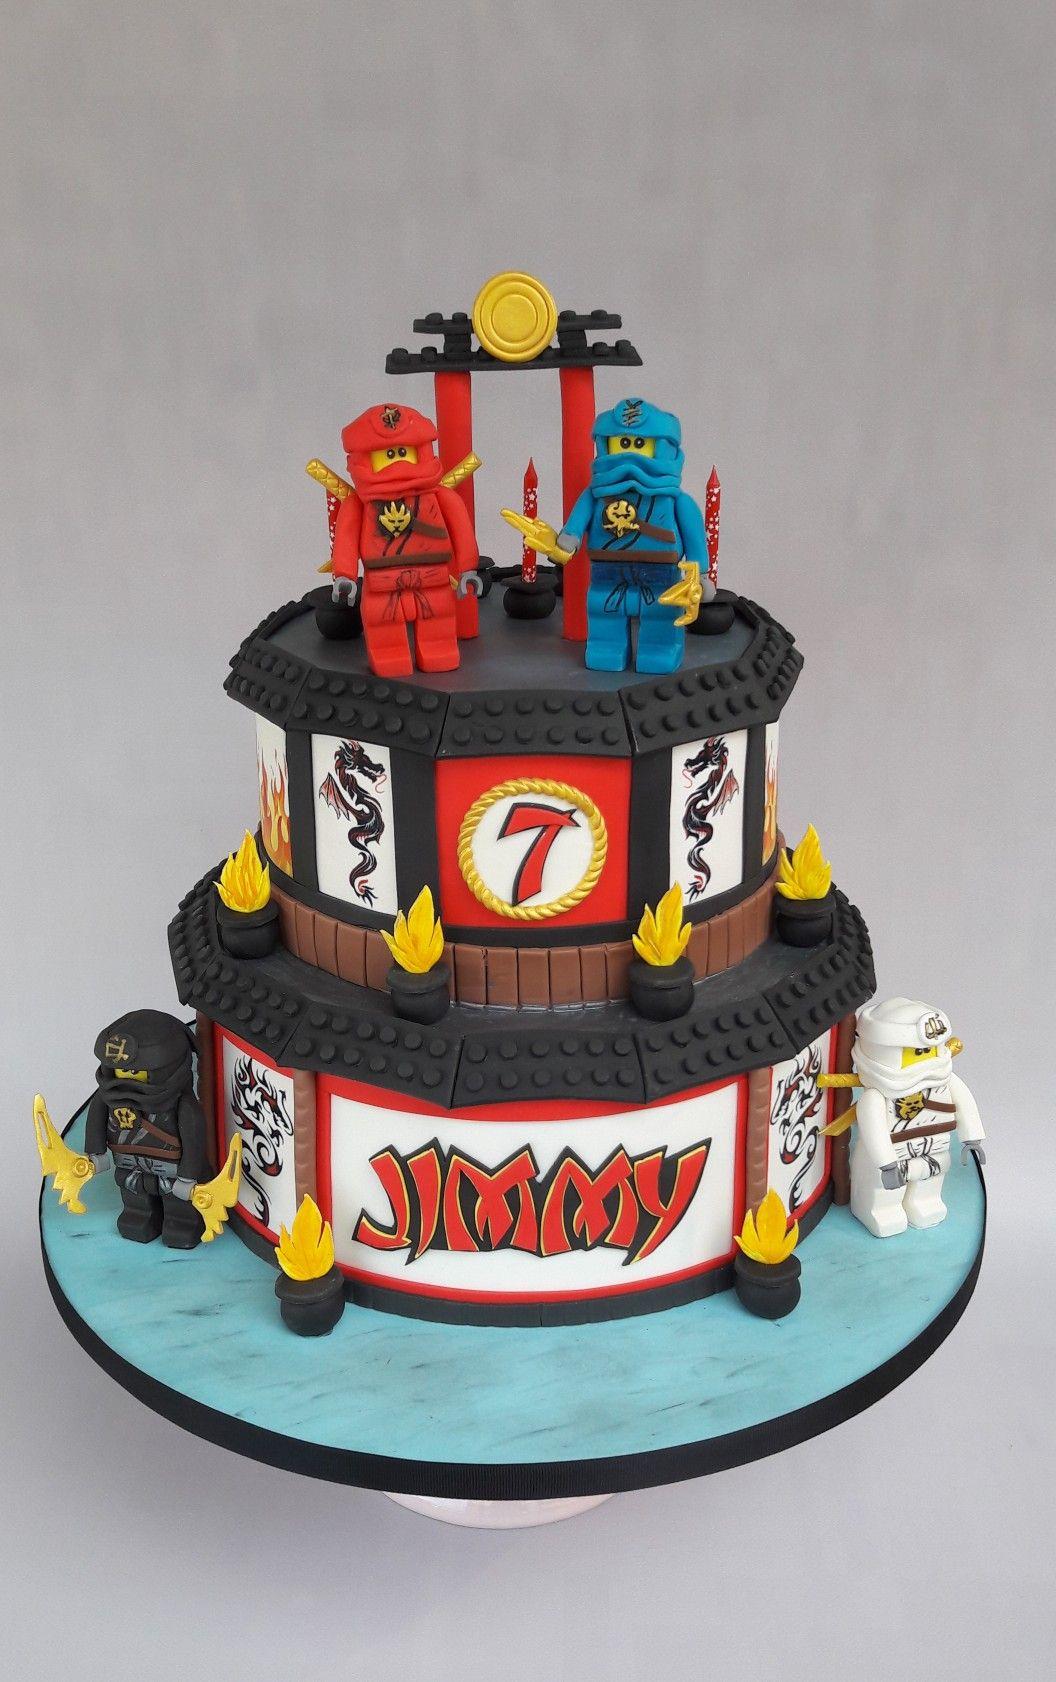 Enjoyable Lego Ninjago Cake Ninjago Cakes Lego Ninjago Cake Lego Ninjago Funny Birthday Cards Online Alyptdamsfinfo